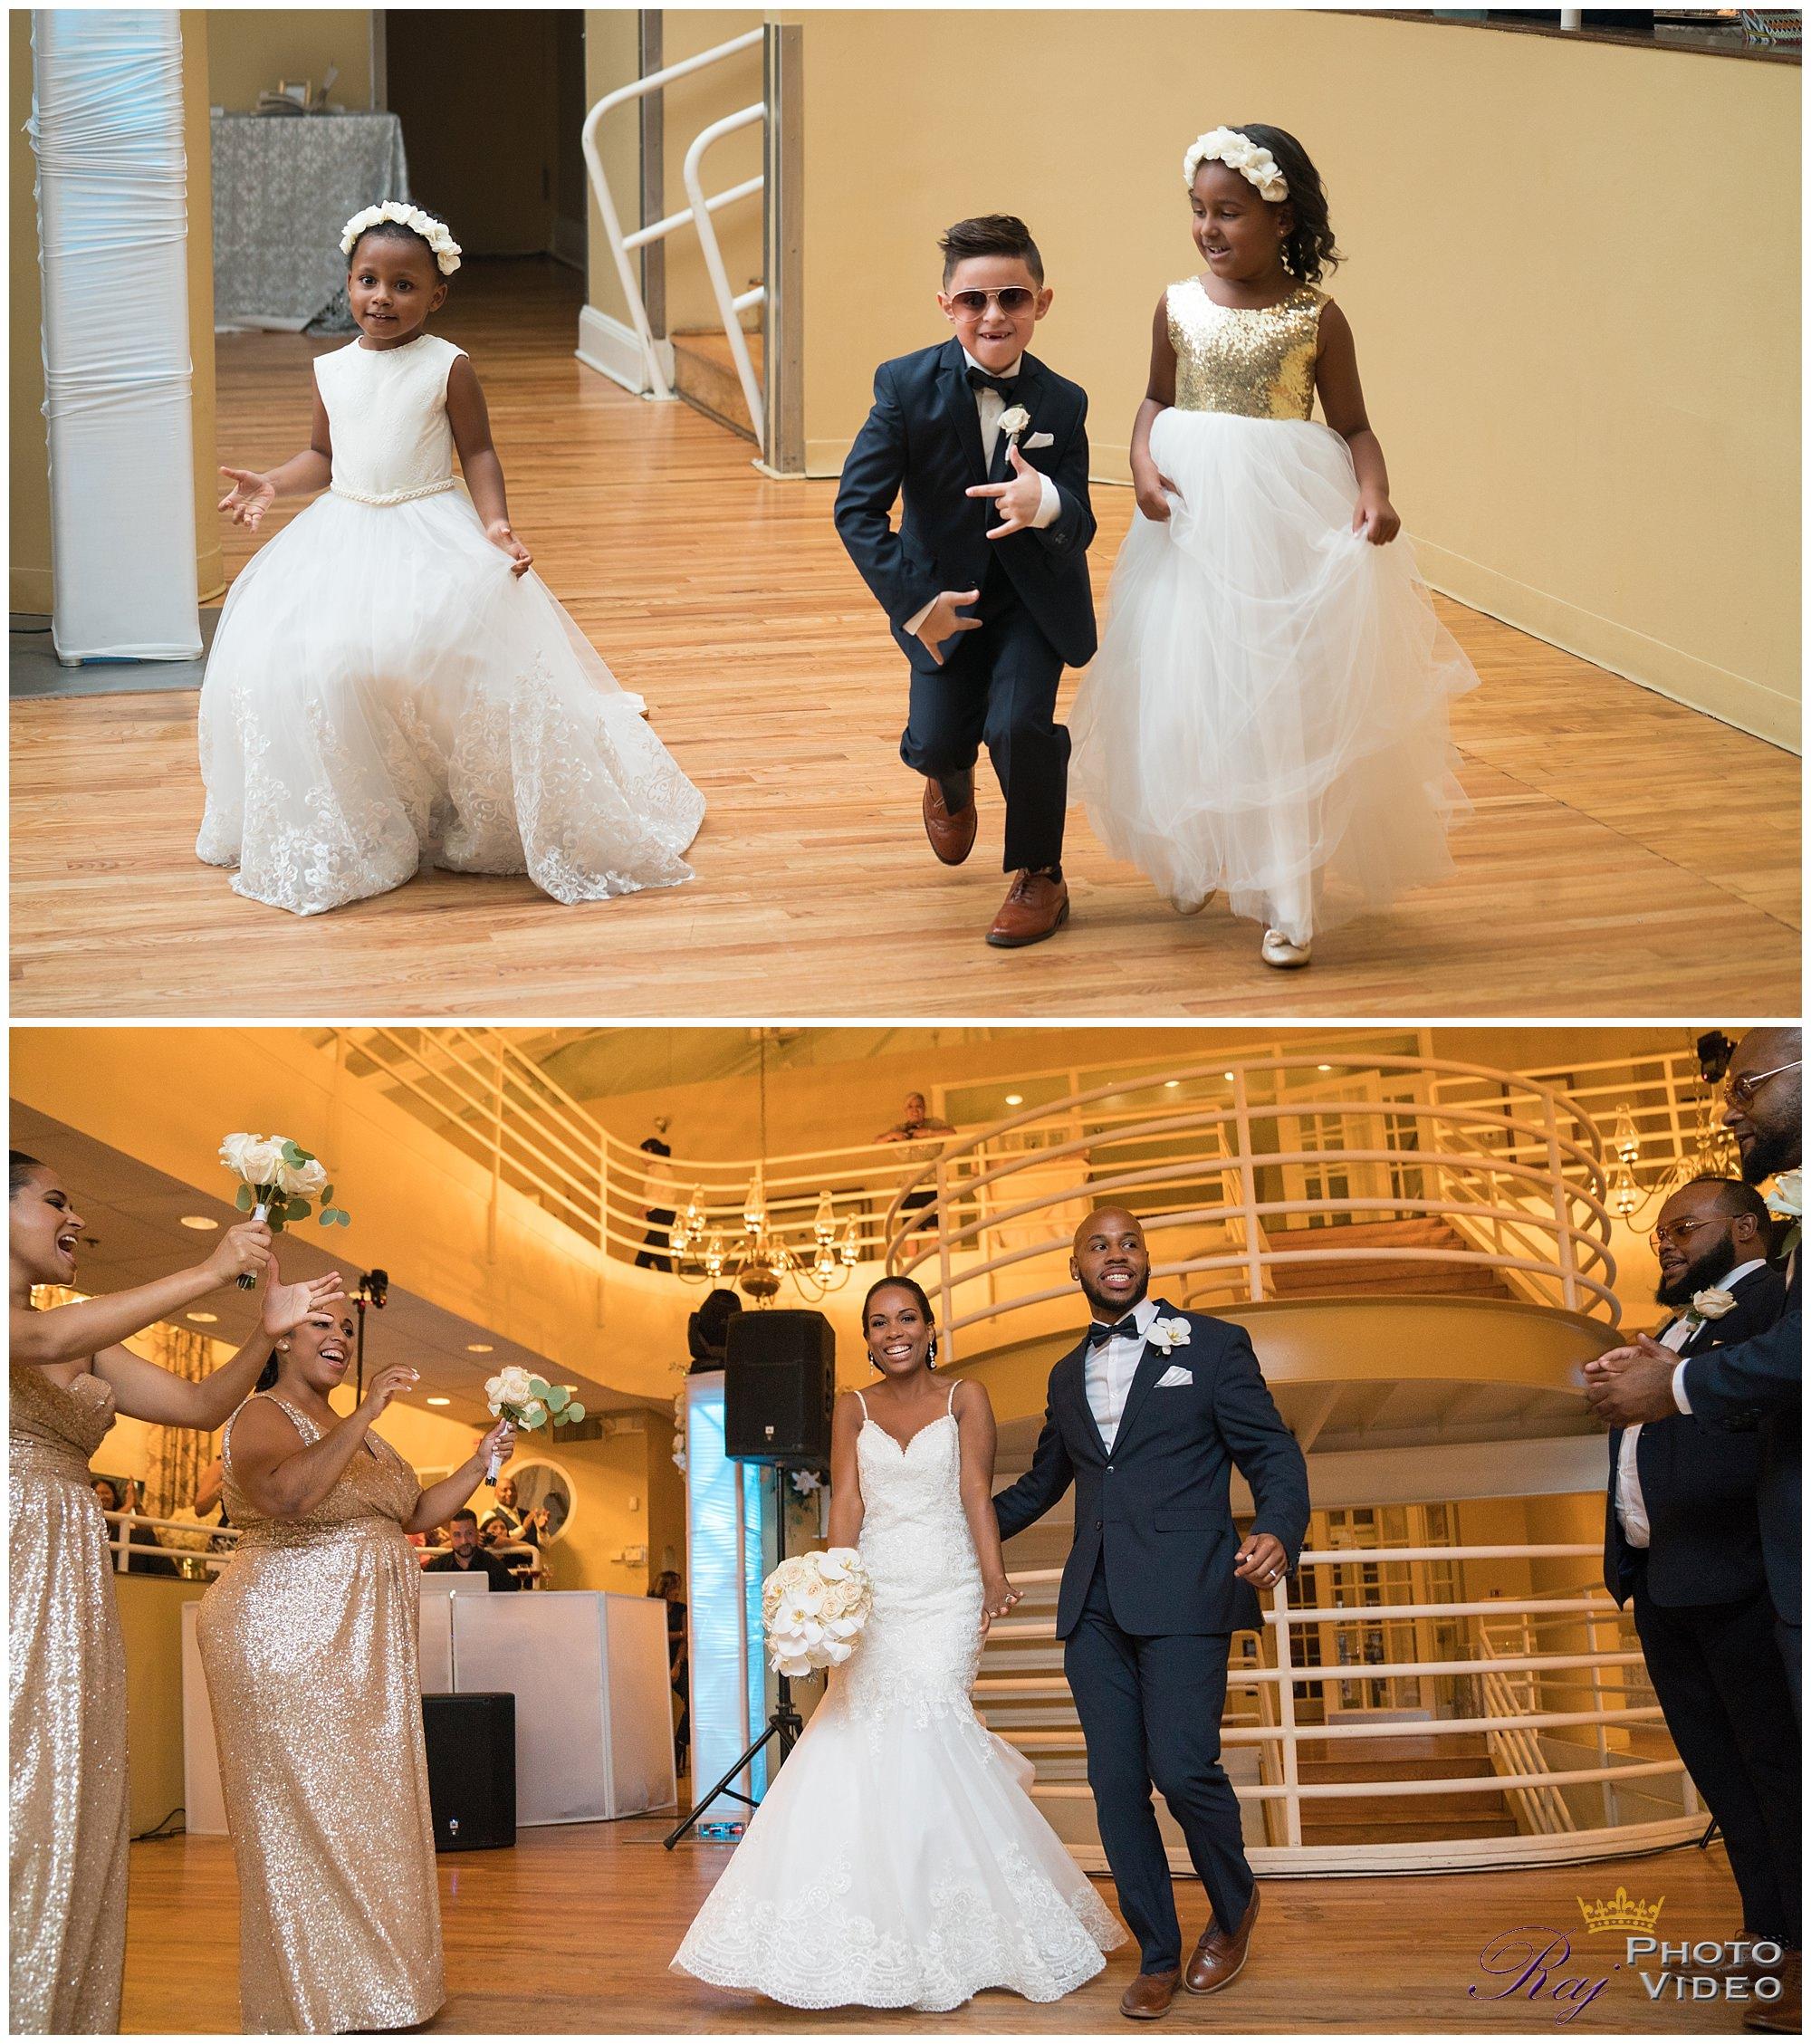 The-Armory-Perth-Amboy-NJ-Catholic-Wedding-Yudelkis-Stephen-20.jpg